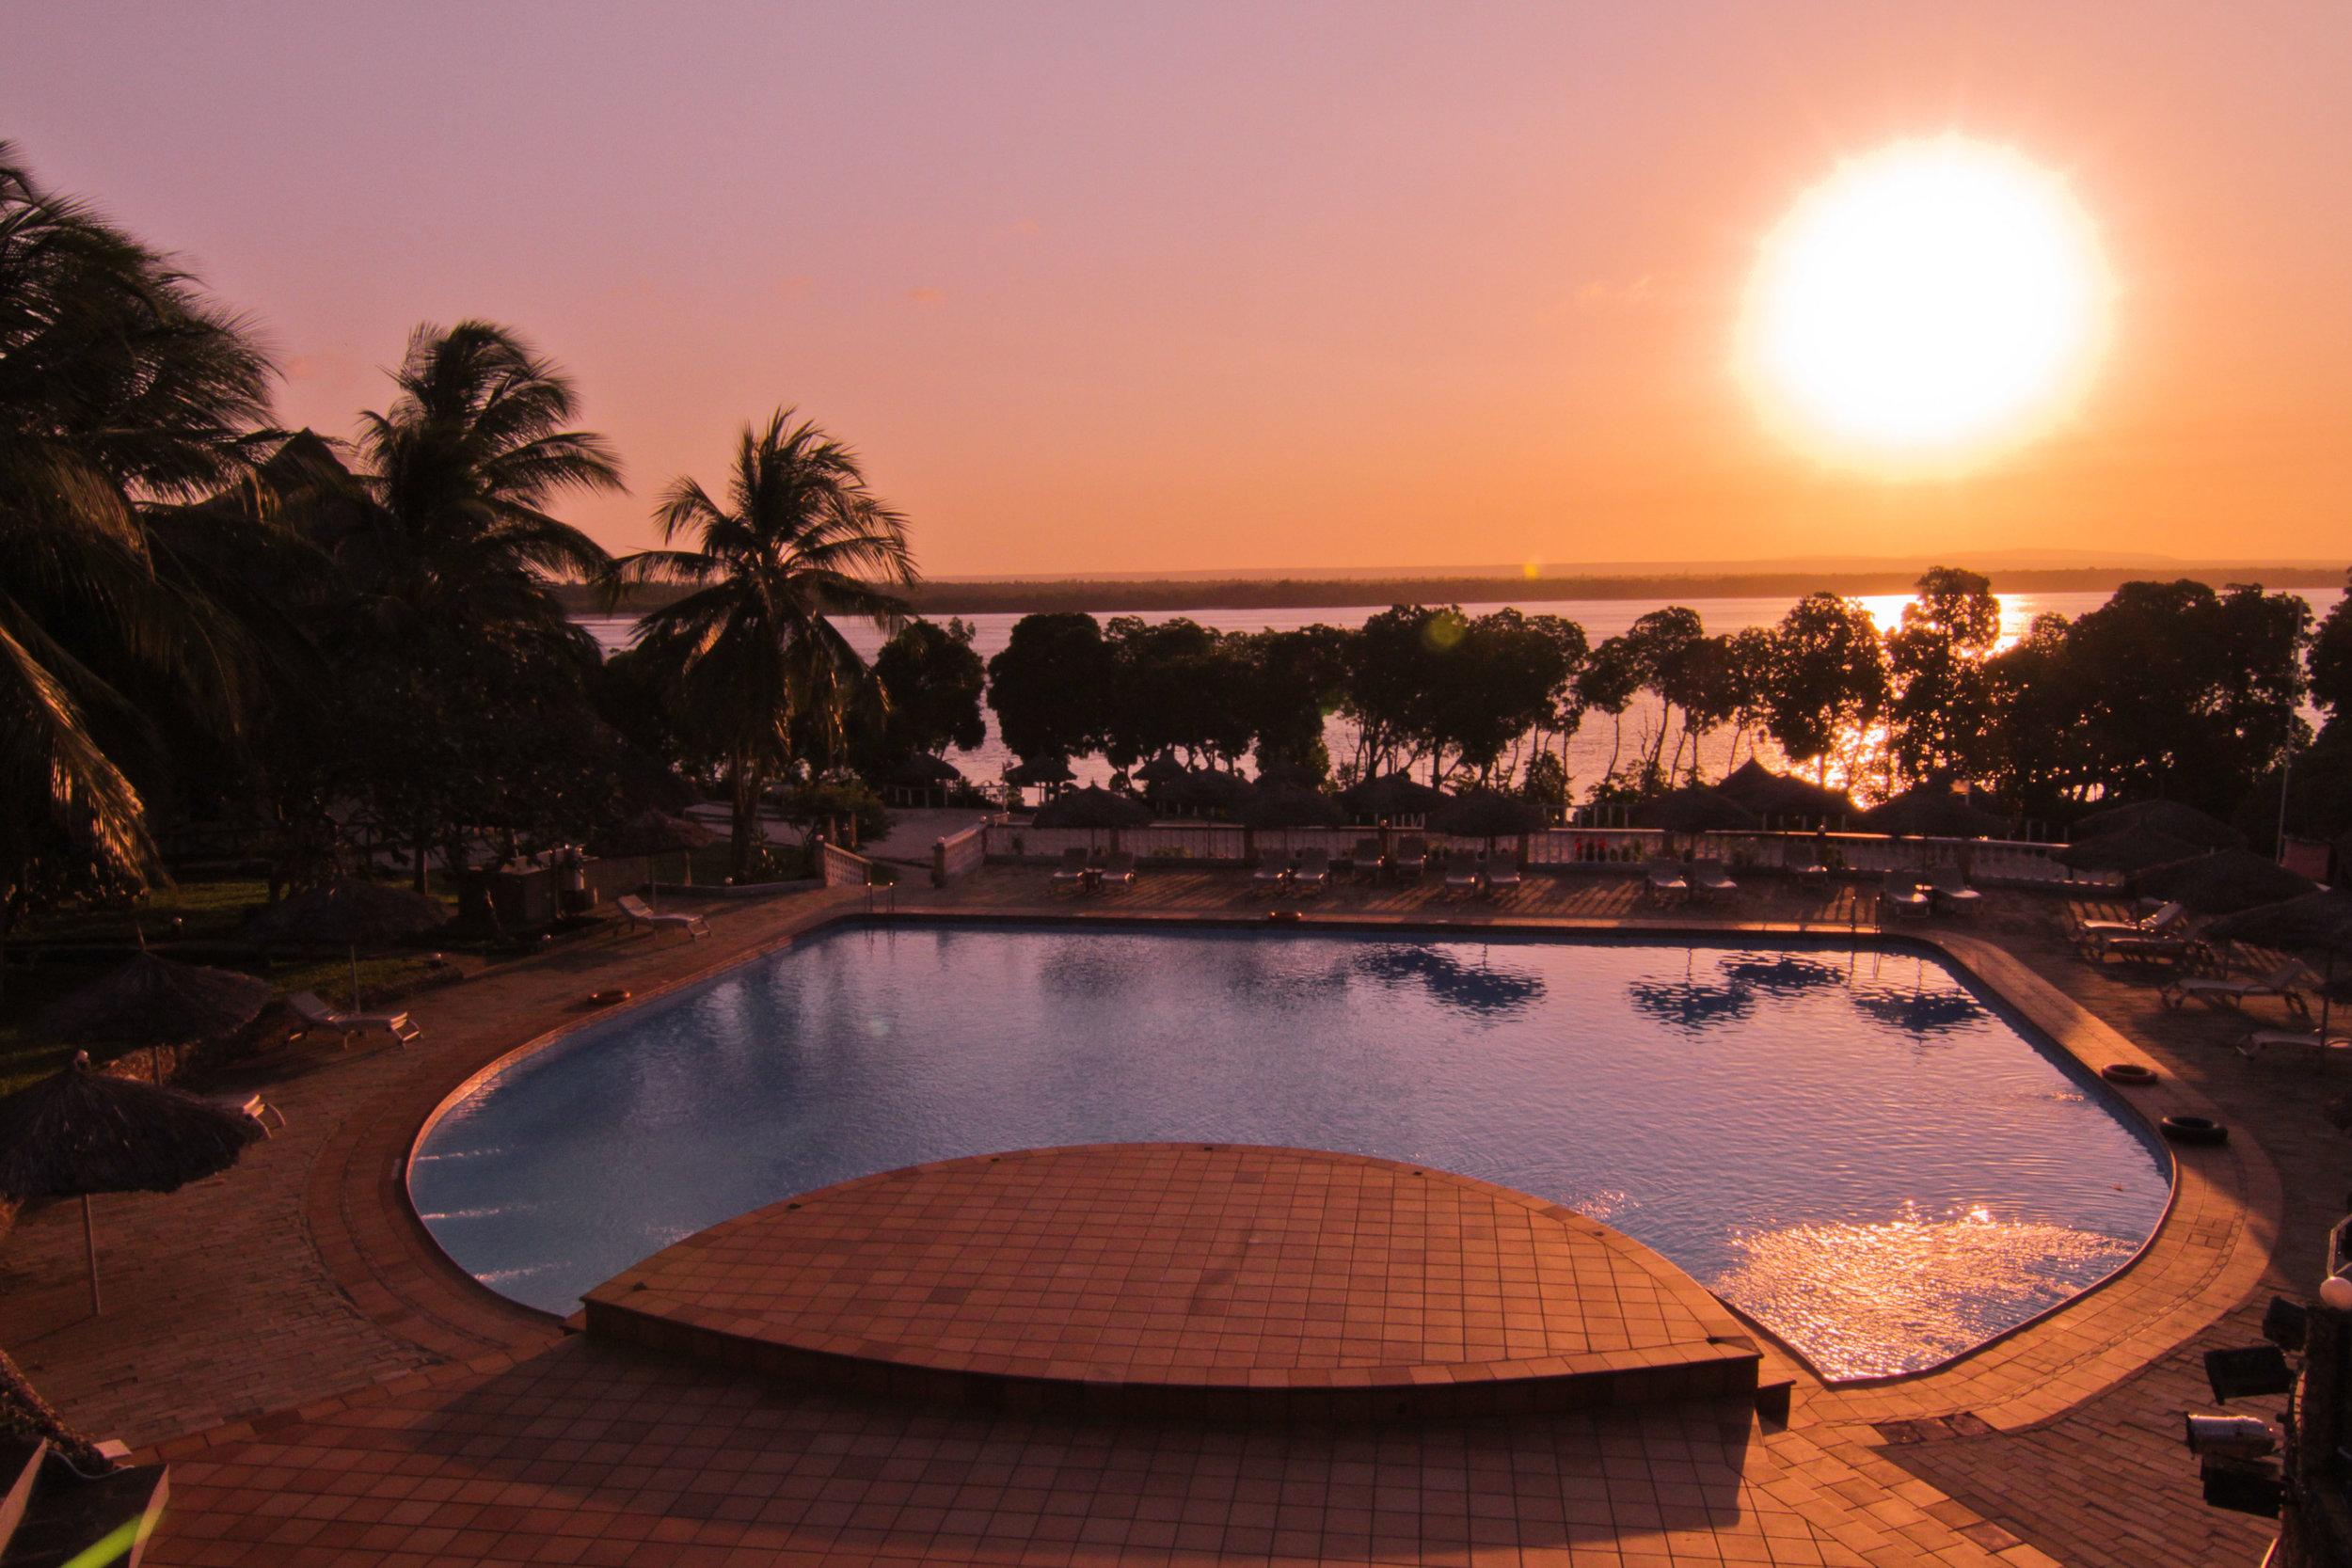 Sunset-Pool-7913.jpg